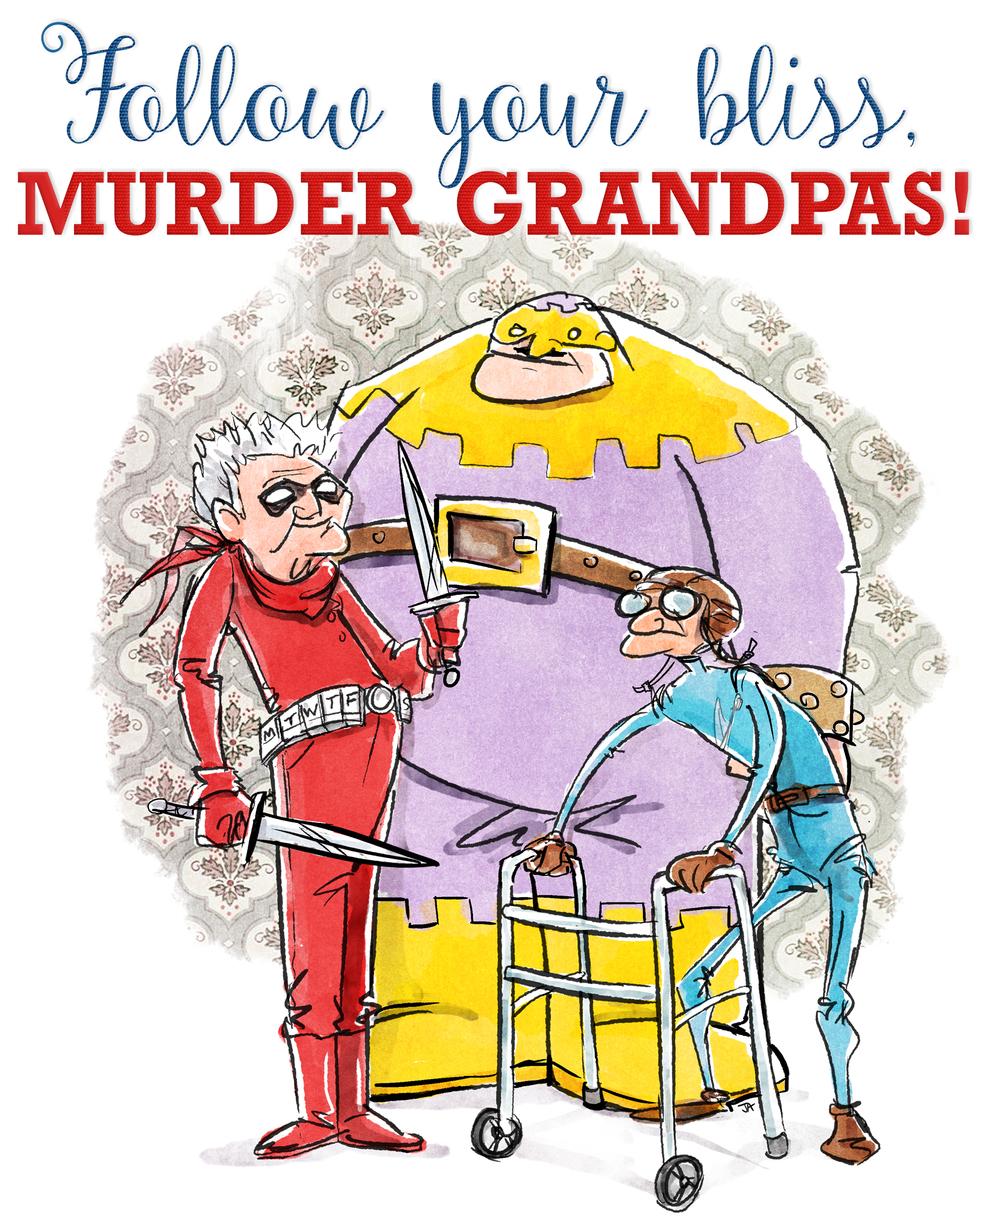 Murder Grandpas!